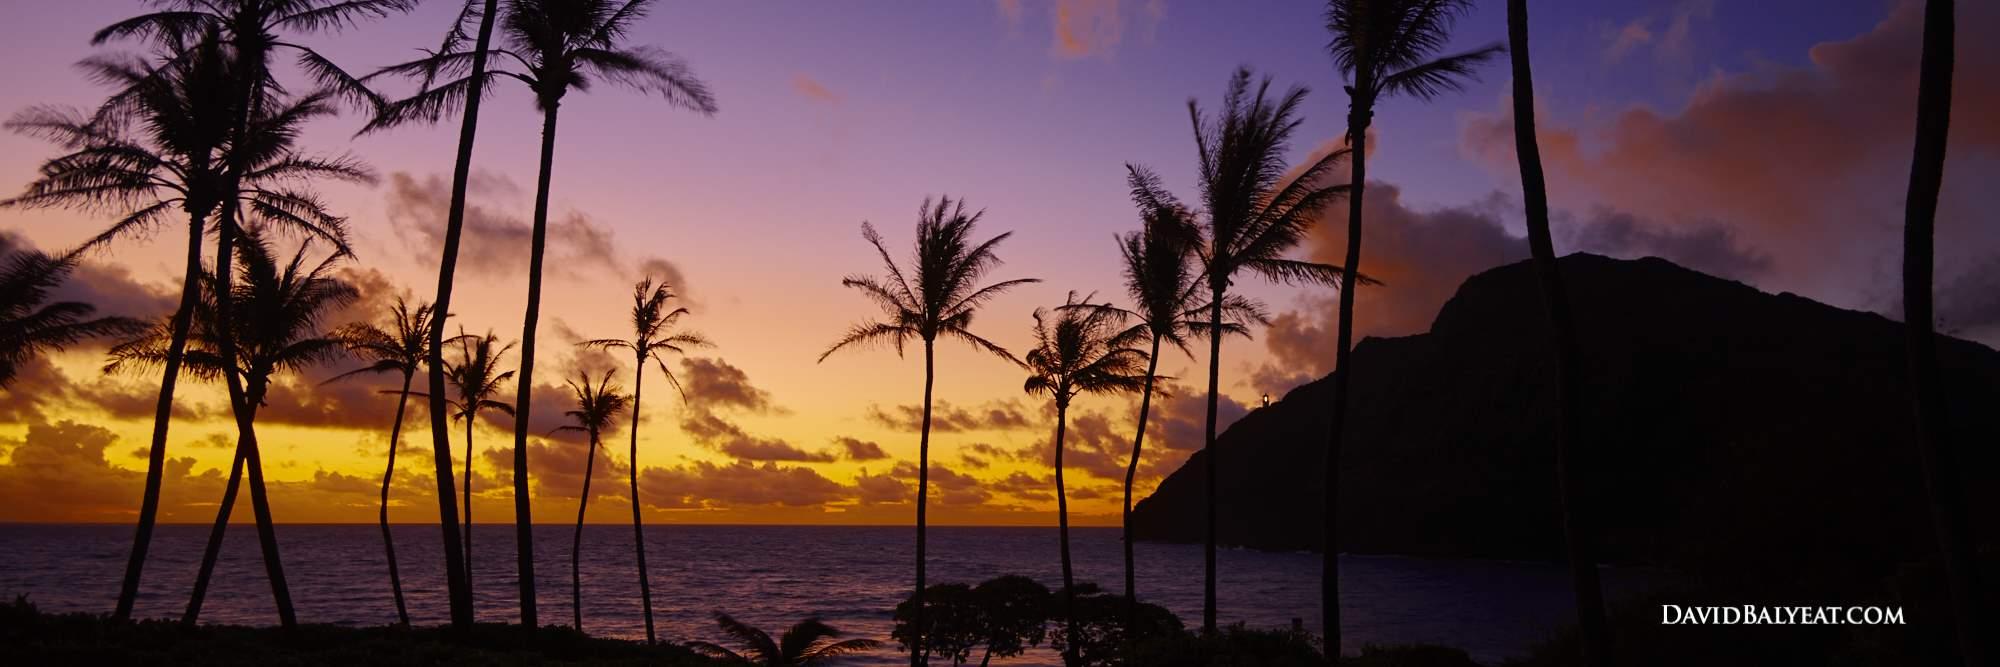 Palm trees Mokapu'u beach park hawaii panoramic sunrise high definition HD professional photography